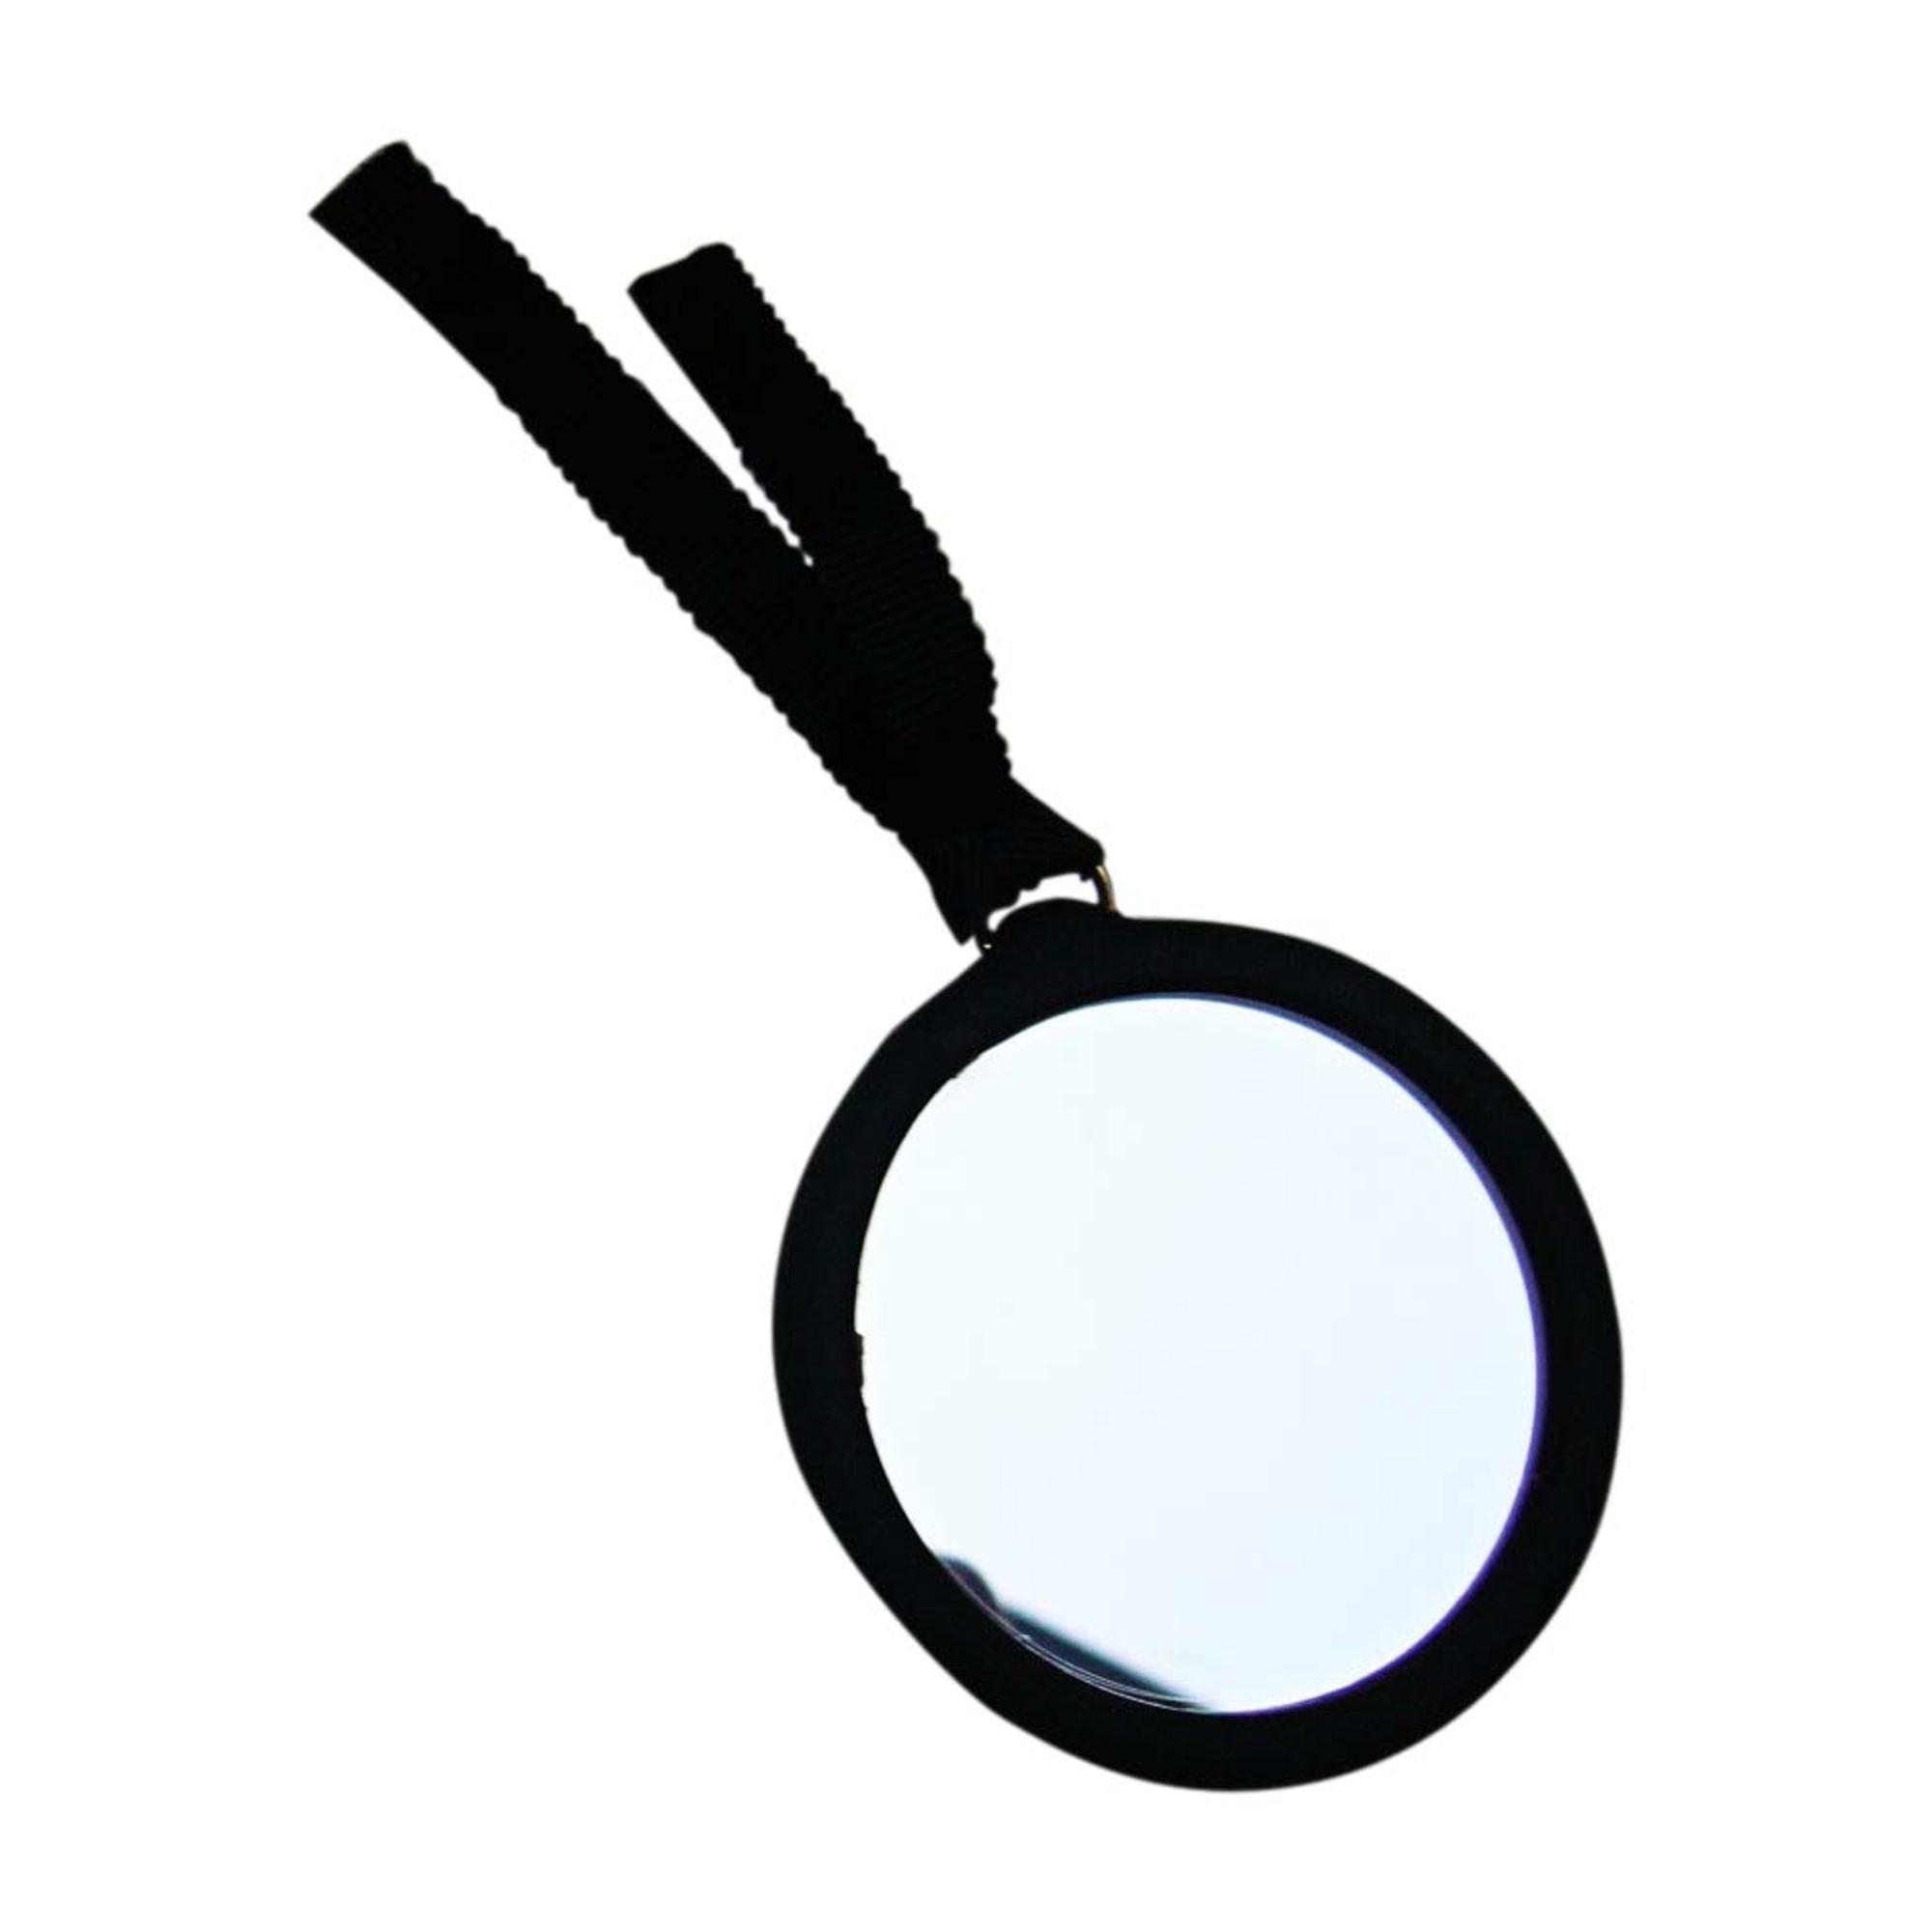 Pochette BURBERRY aspect gomme noir